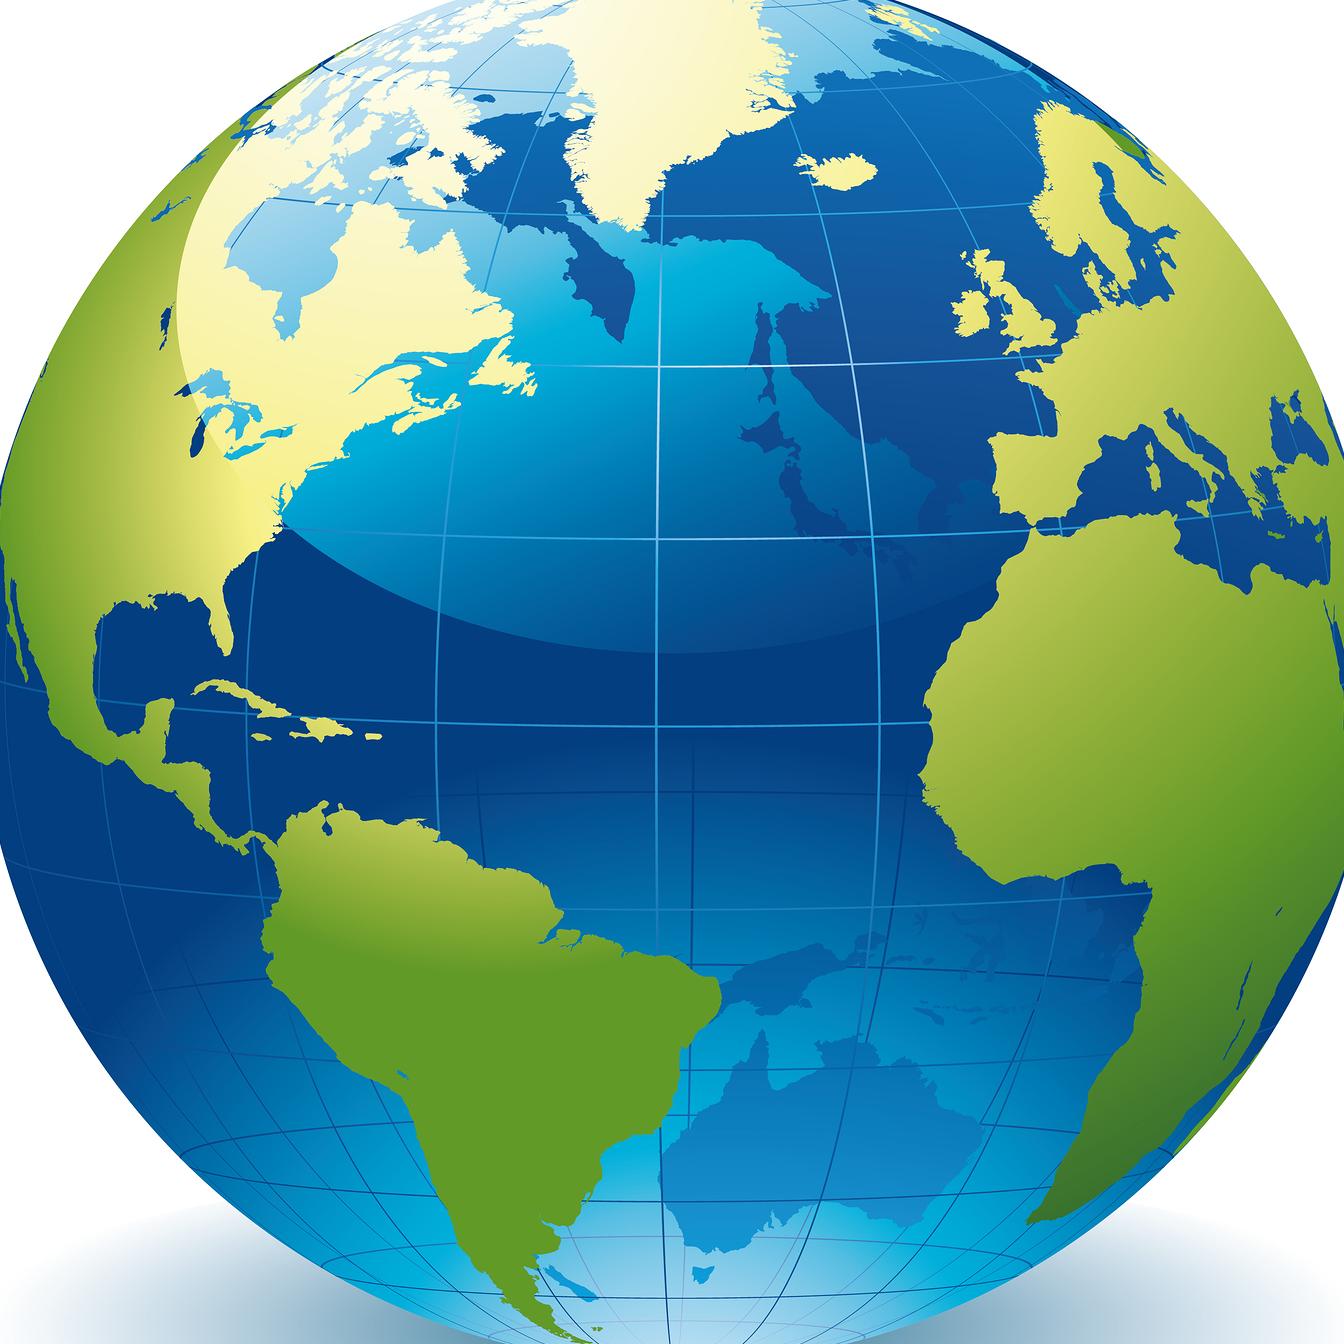 State capital group homepage. Clipart world globe europe